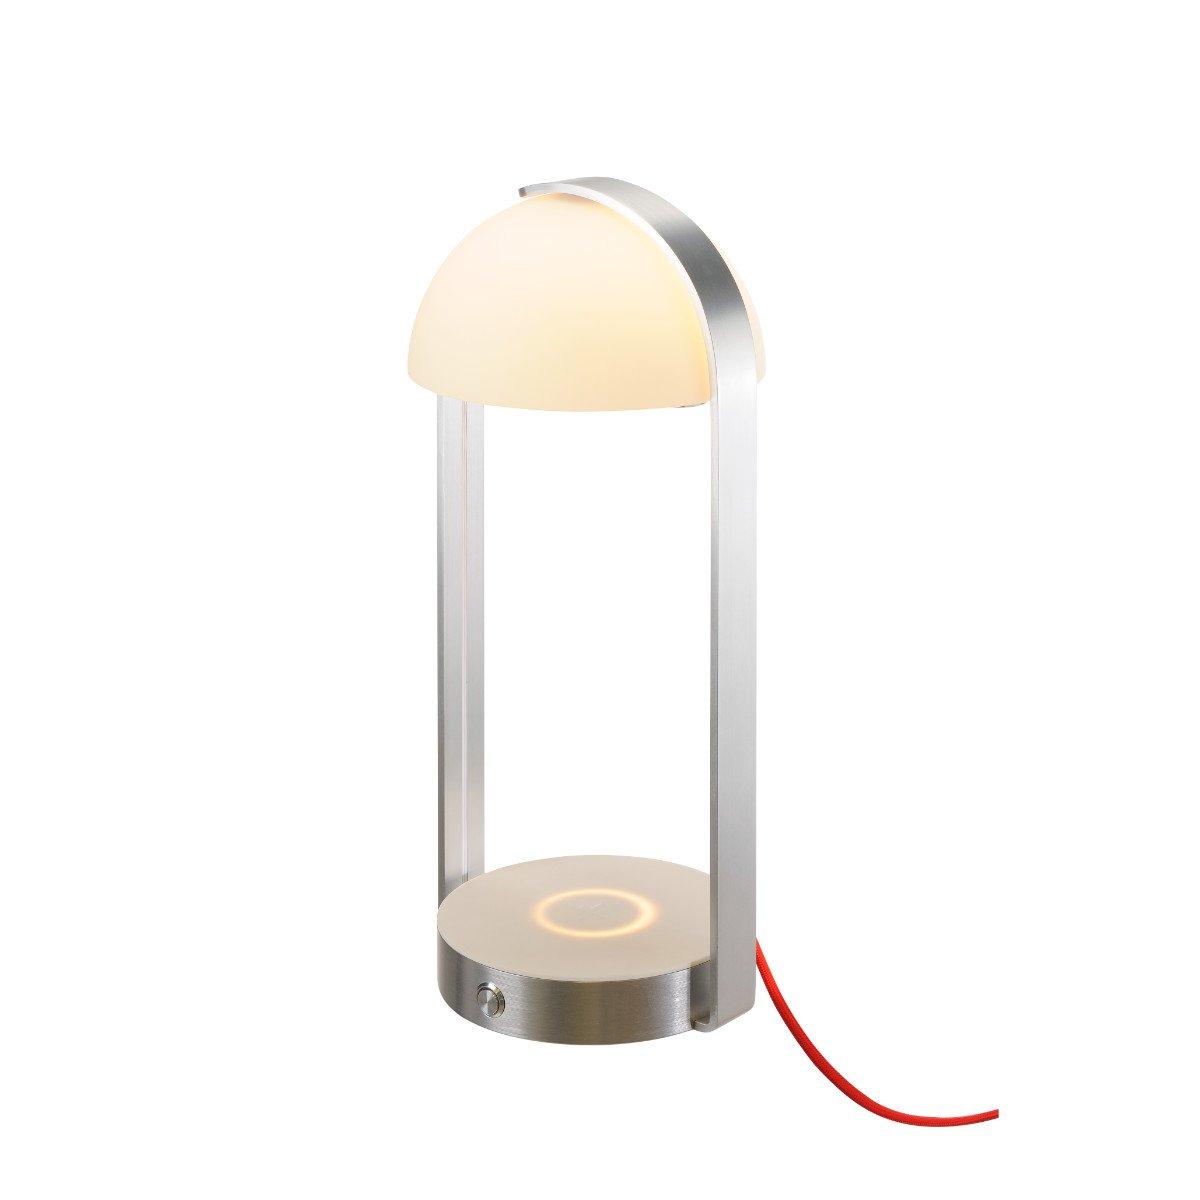 SLV - verlichting Tafellamp Brenda SLV. 146111